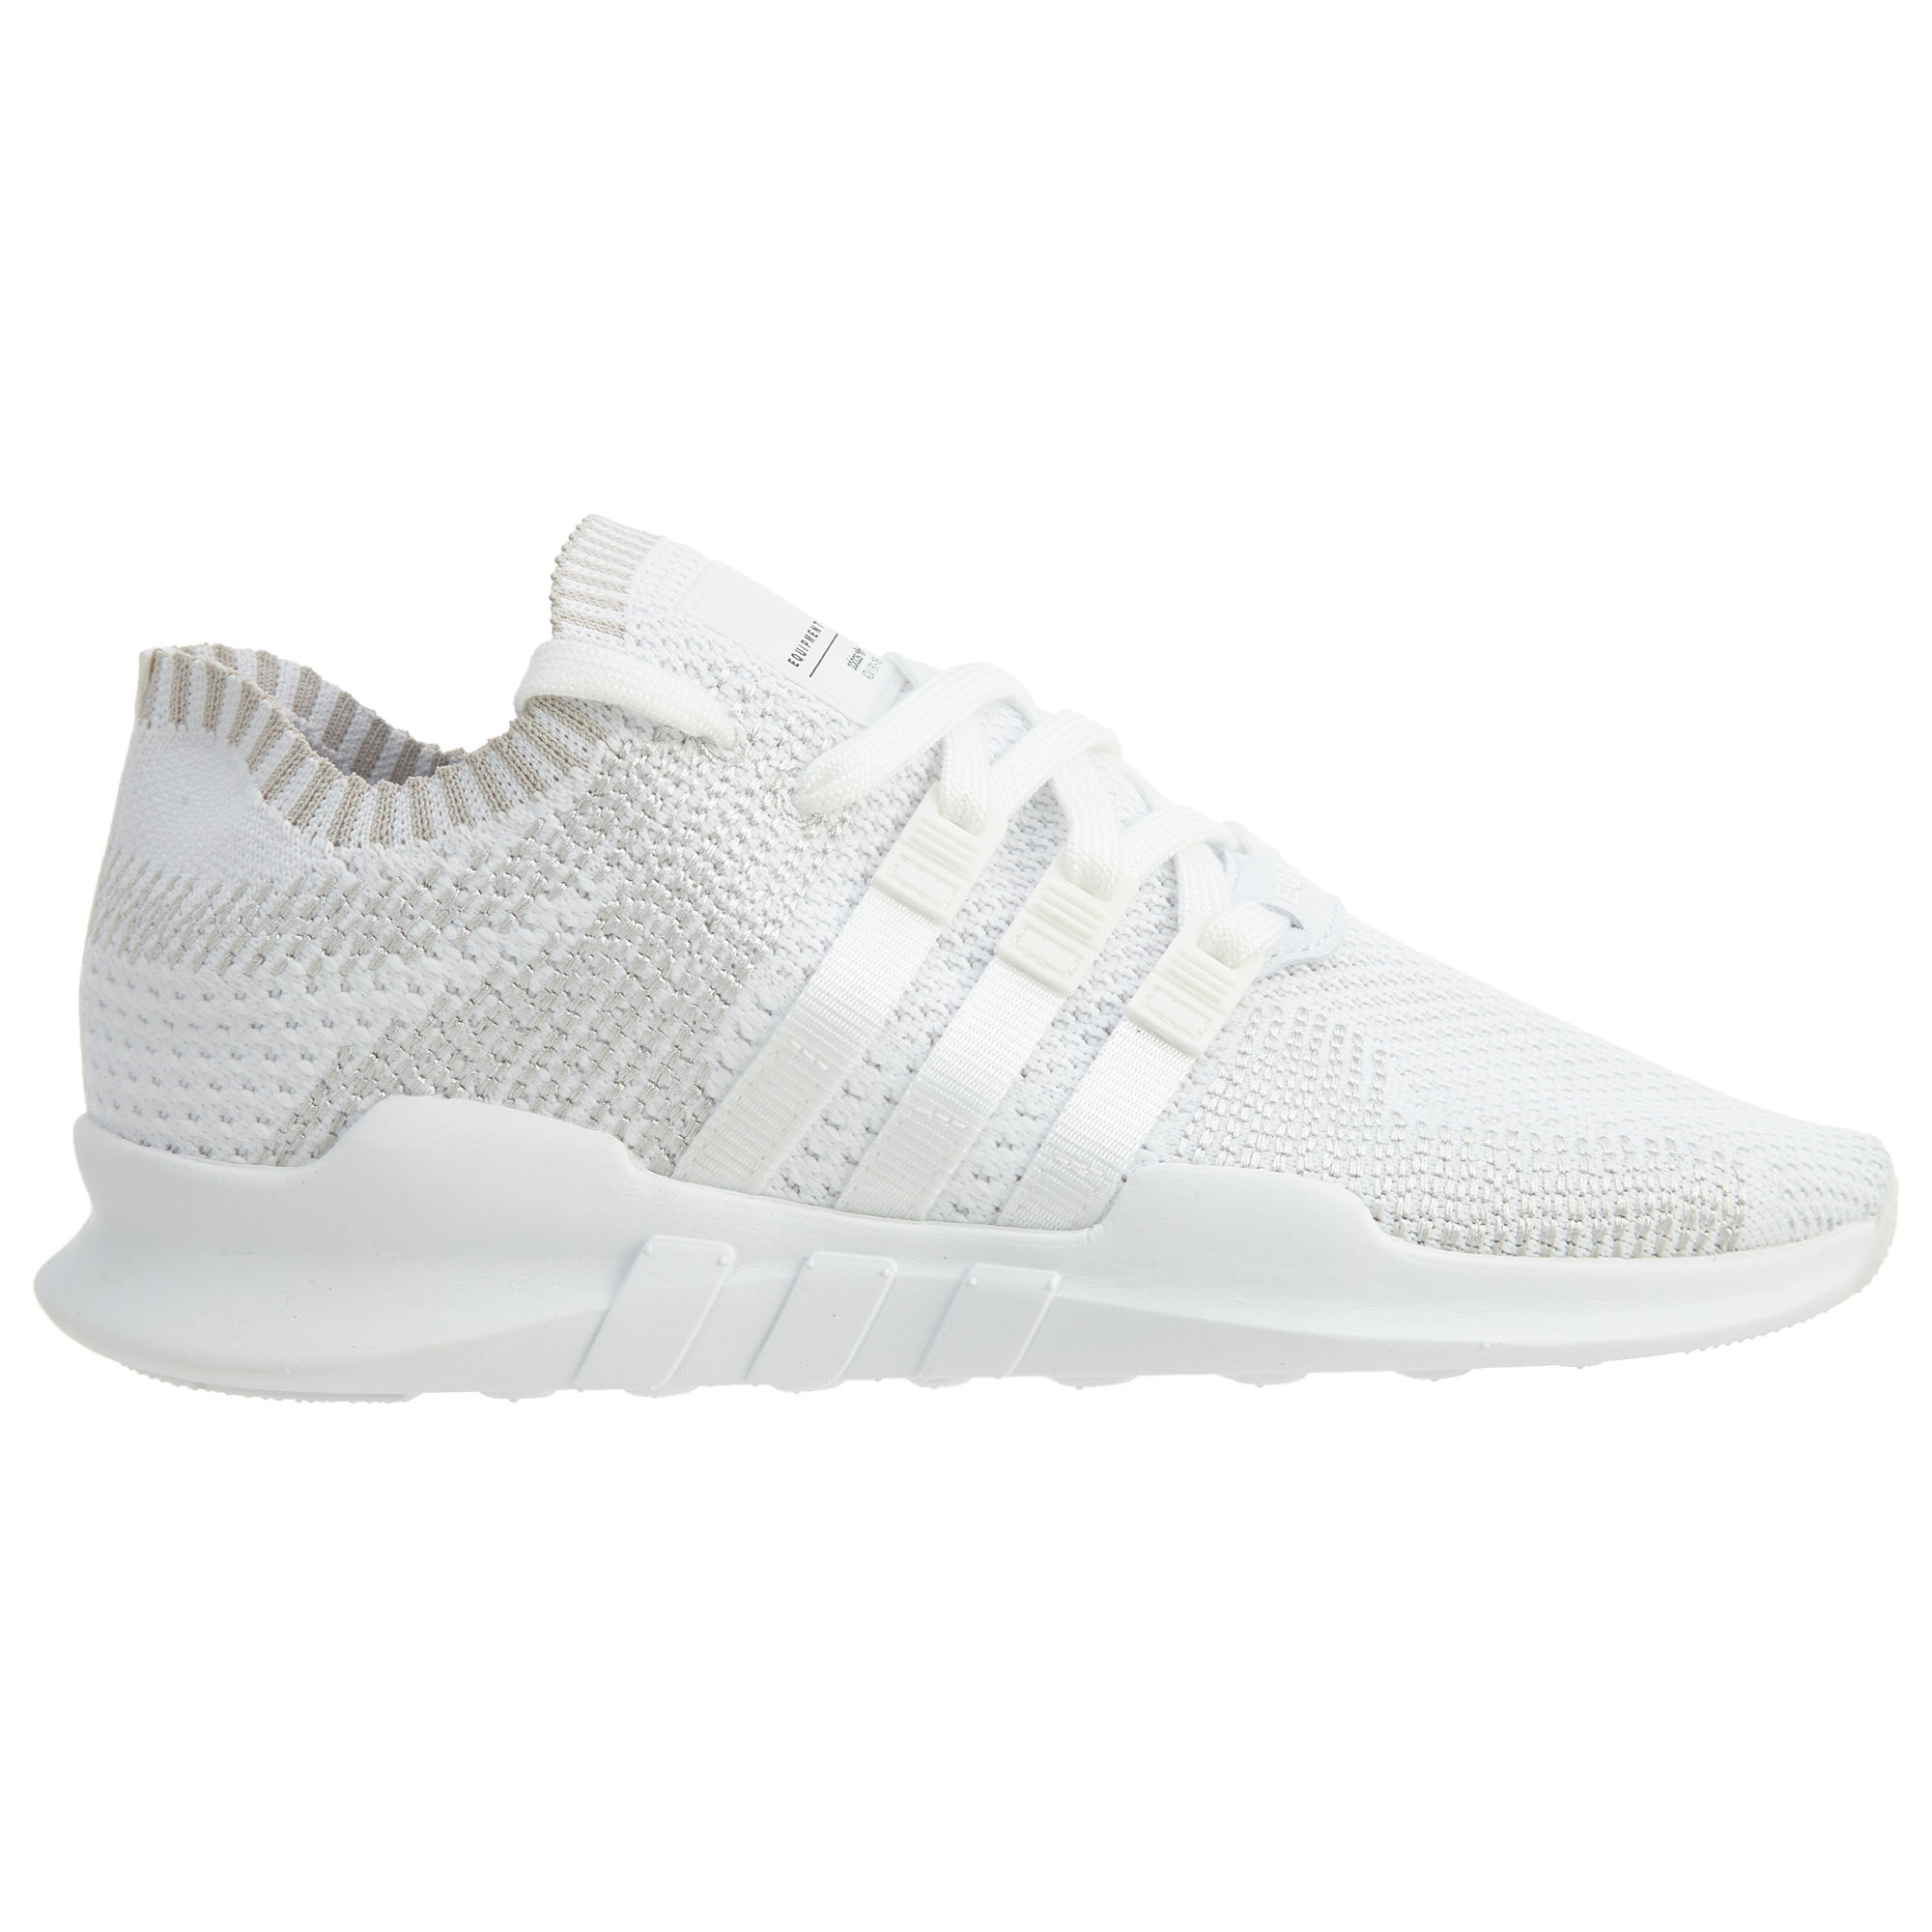 adidas Eqt Support Adv Pk Running White Running White-Sub Green